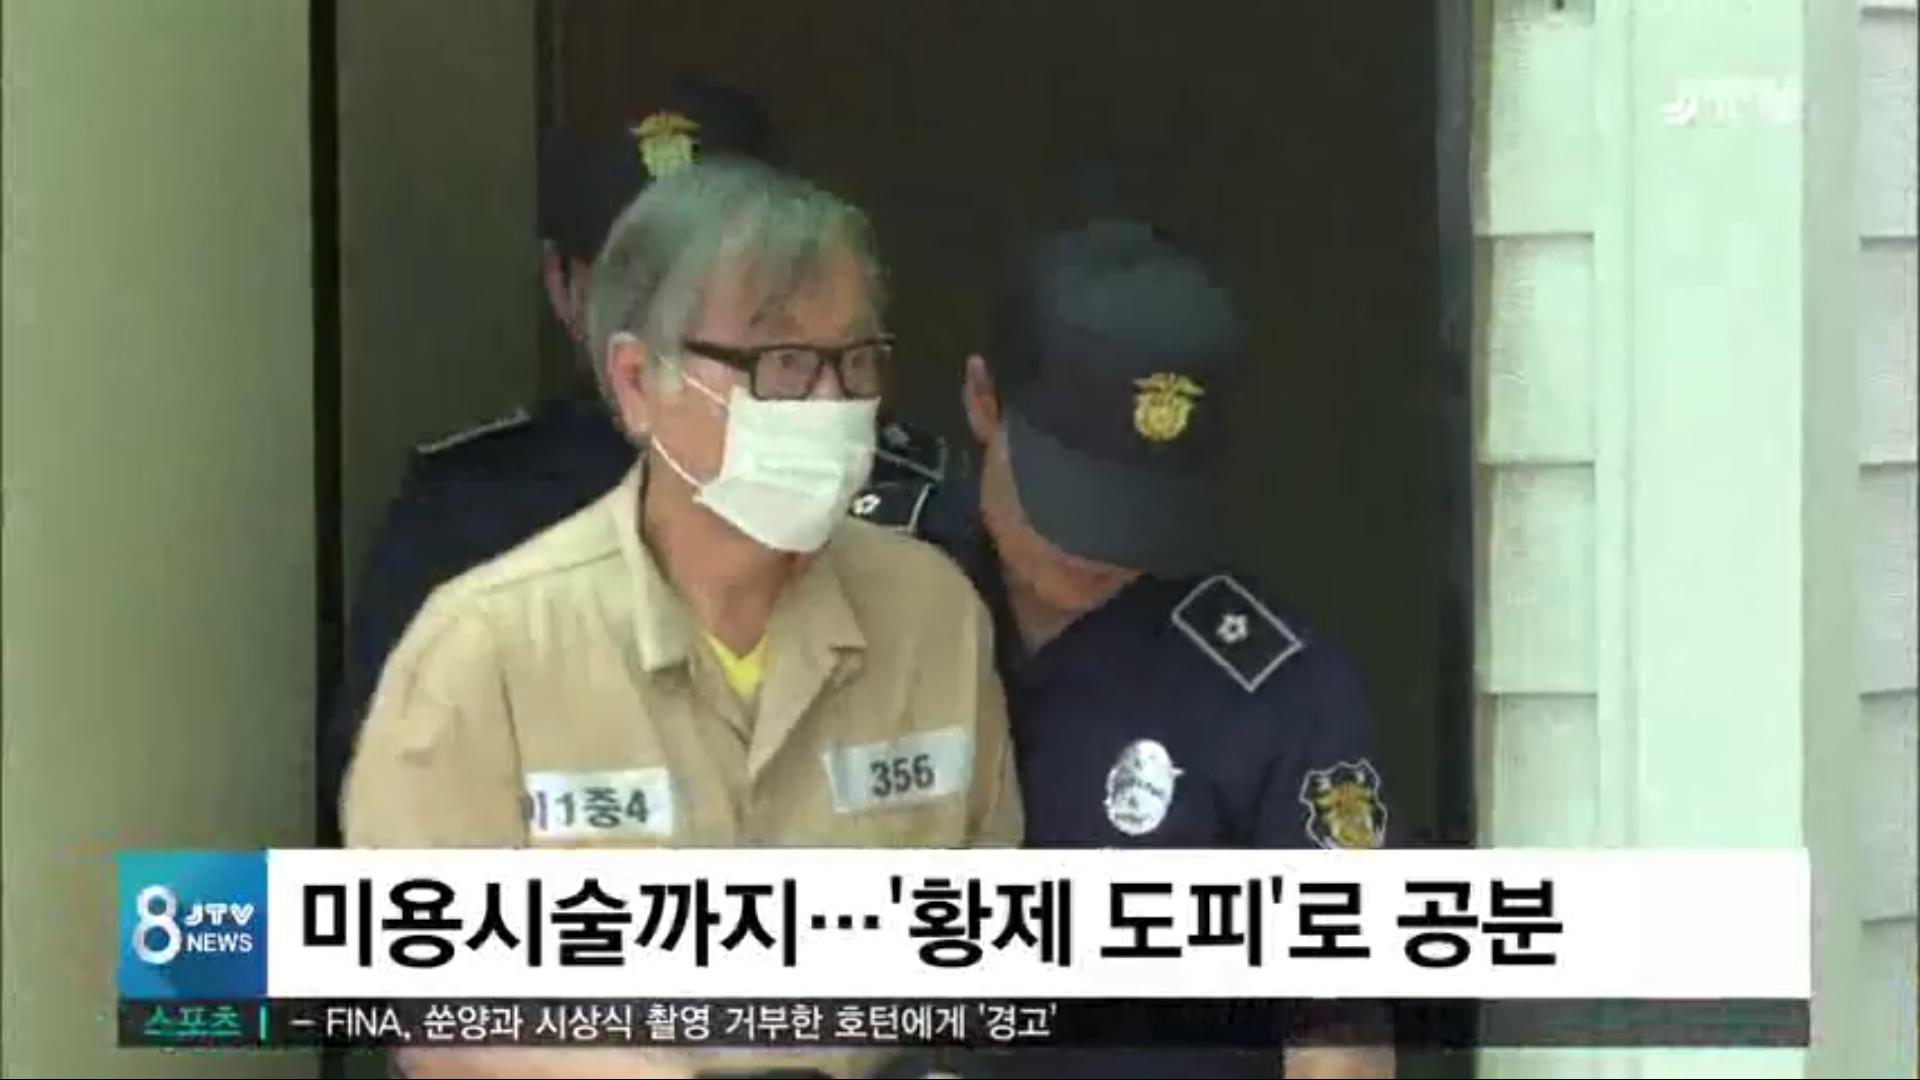 [19.7.23 JTV] 황제 도피 최규호 전 전북교육감, 항소 기각 징역 10년 선고3.jpg